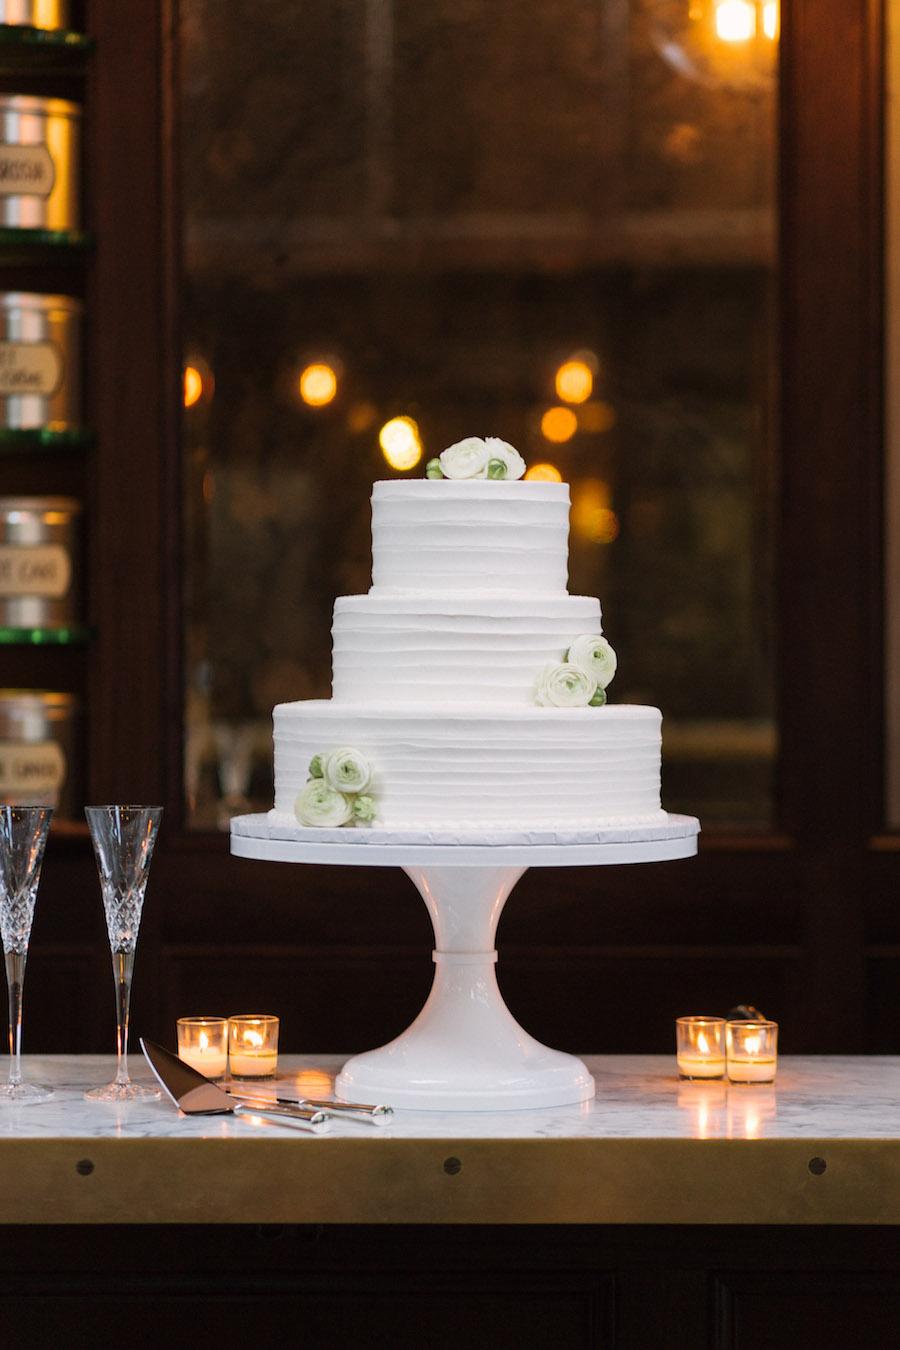 Three Tiered Elegant Round White Textured Wedding Cake